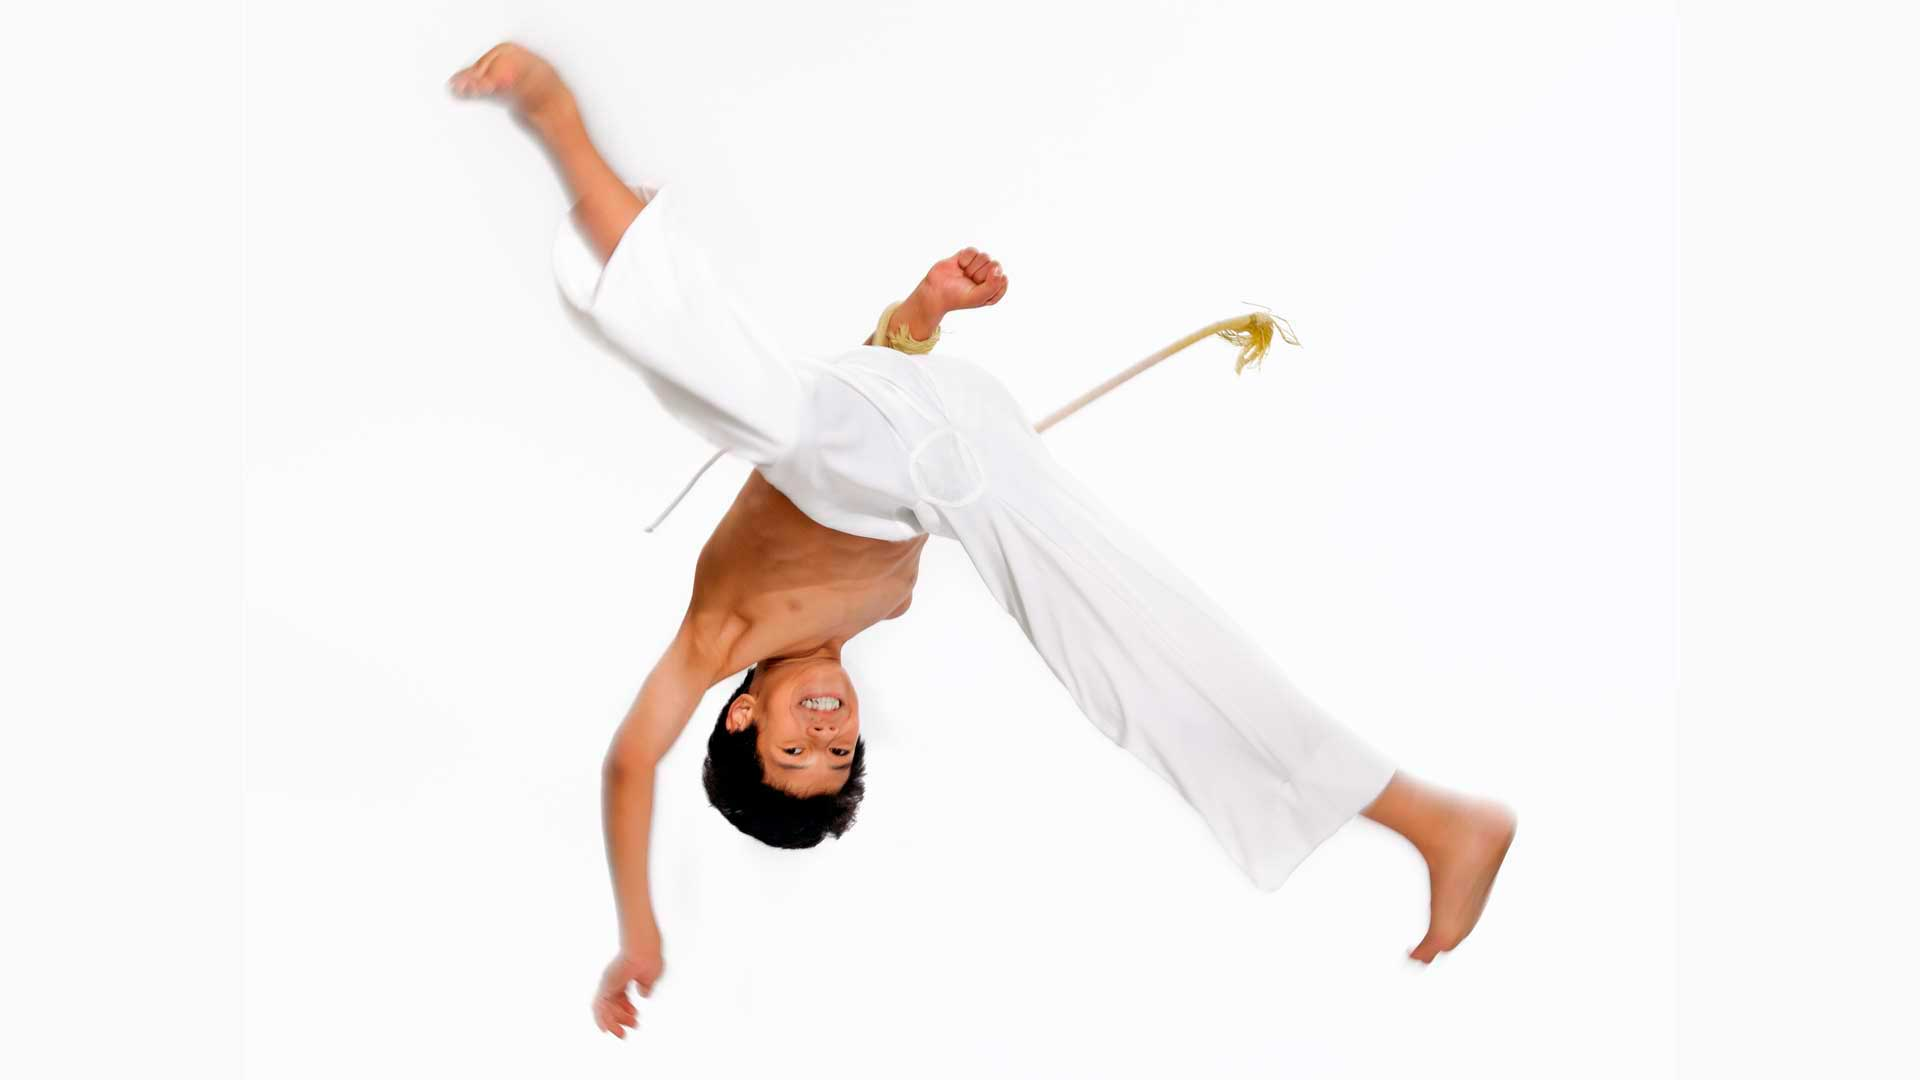 Movimientos-de-capoeira-6